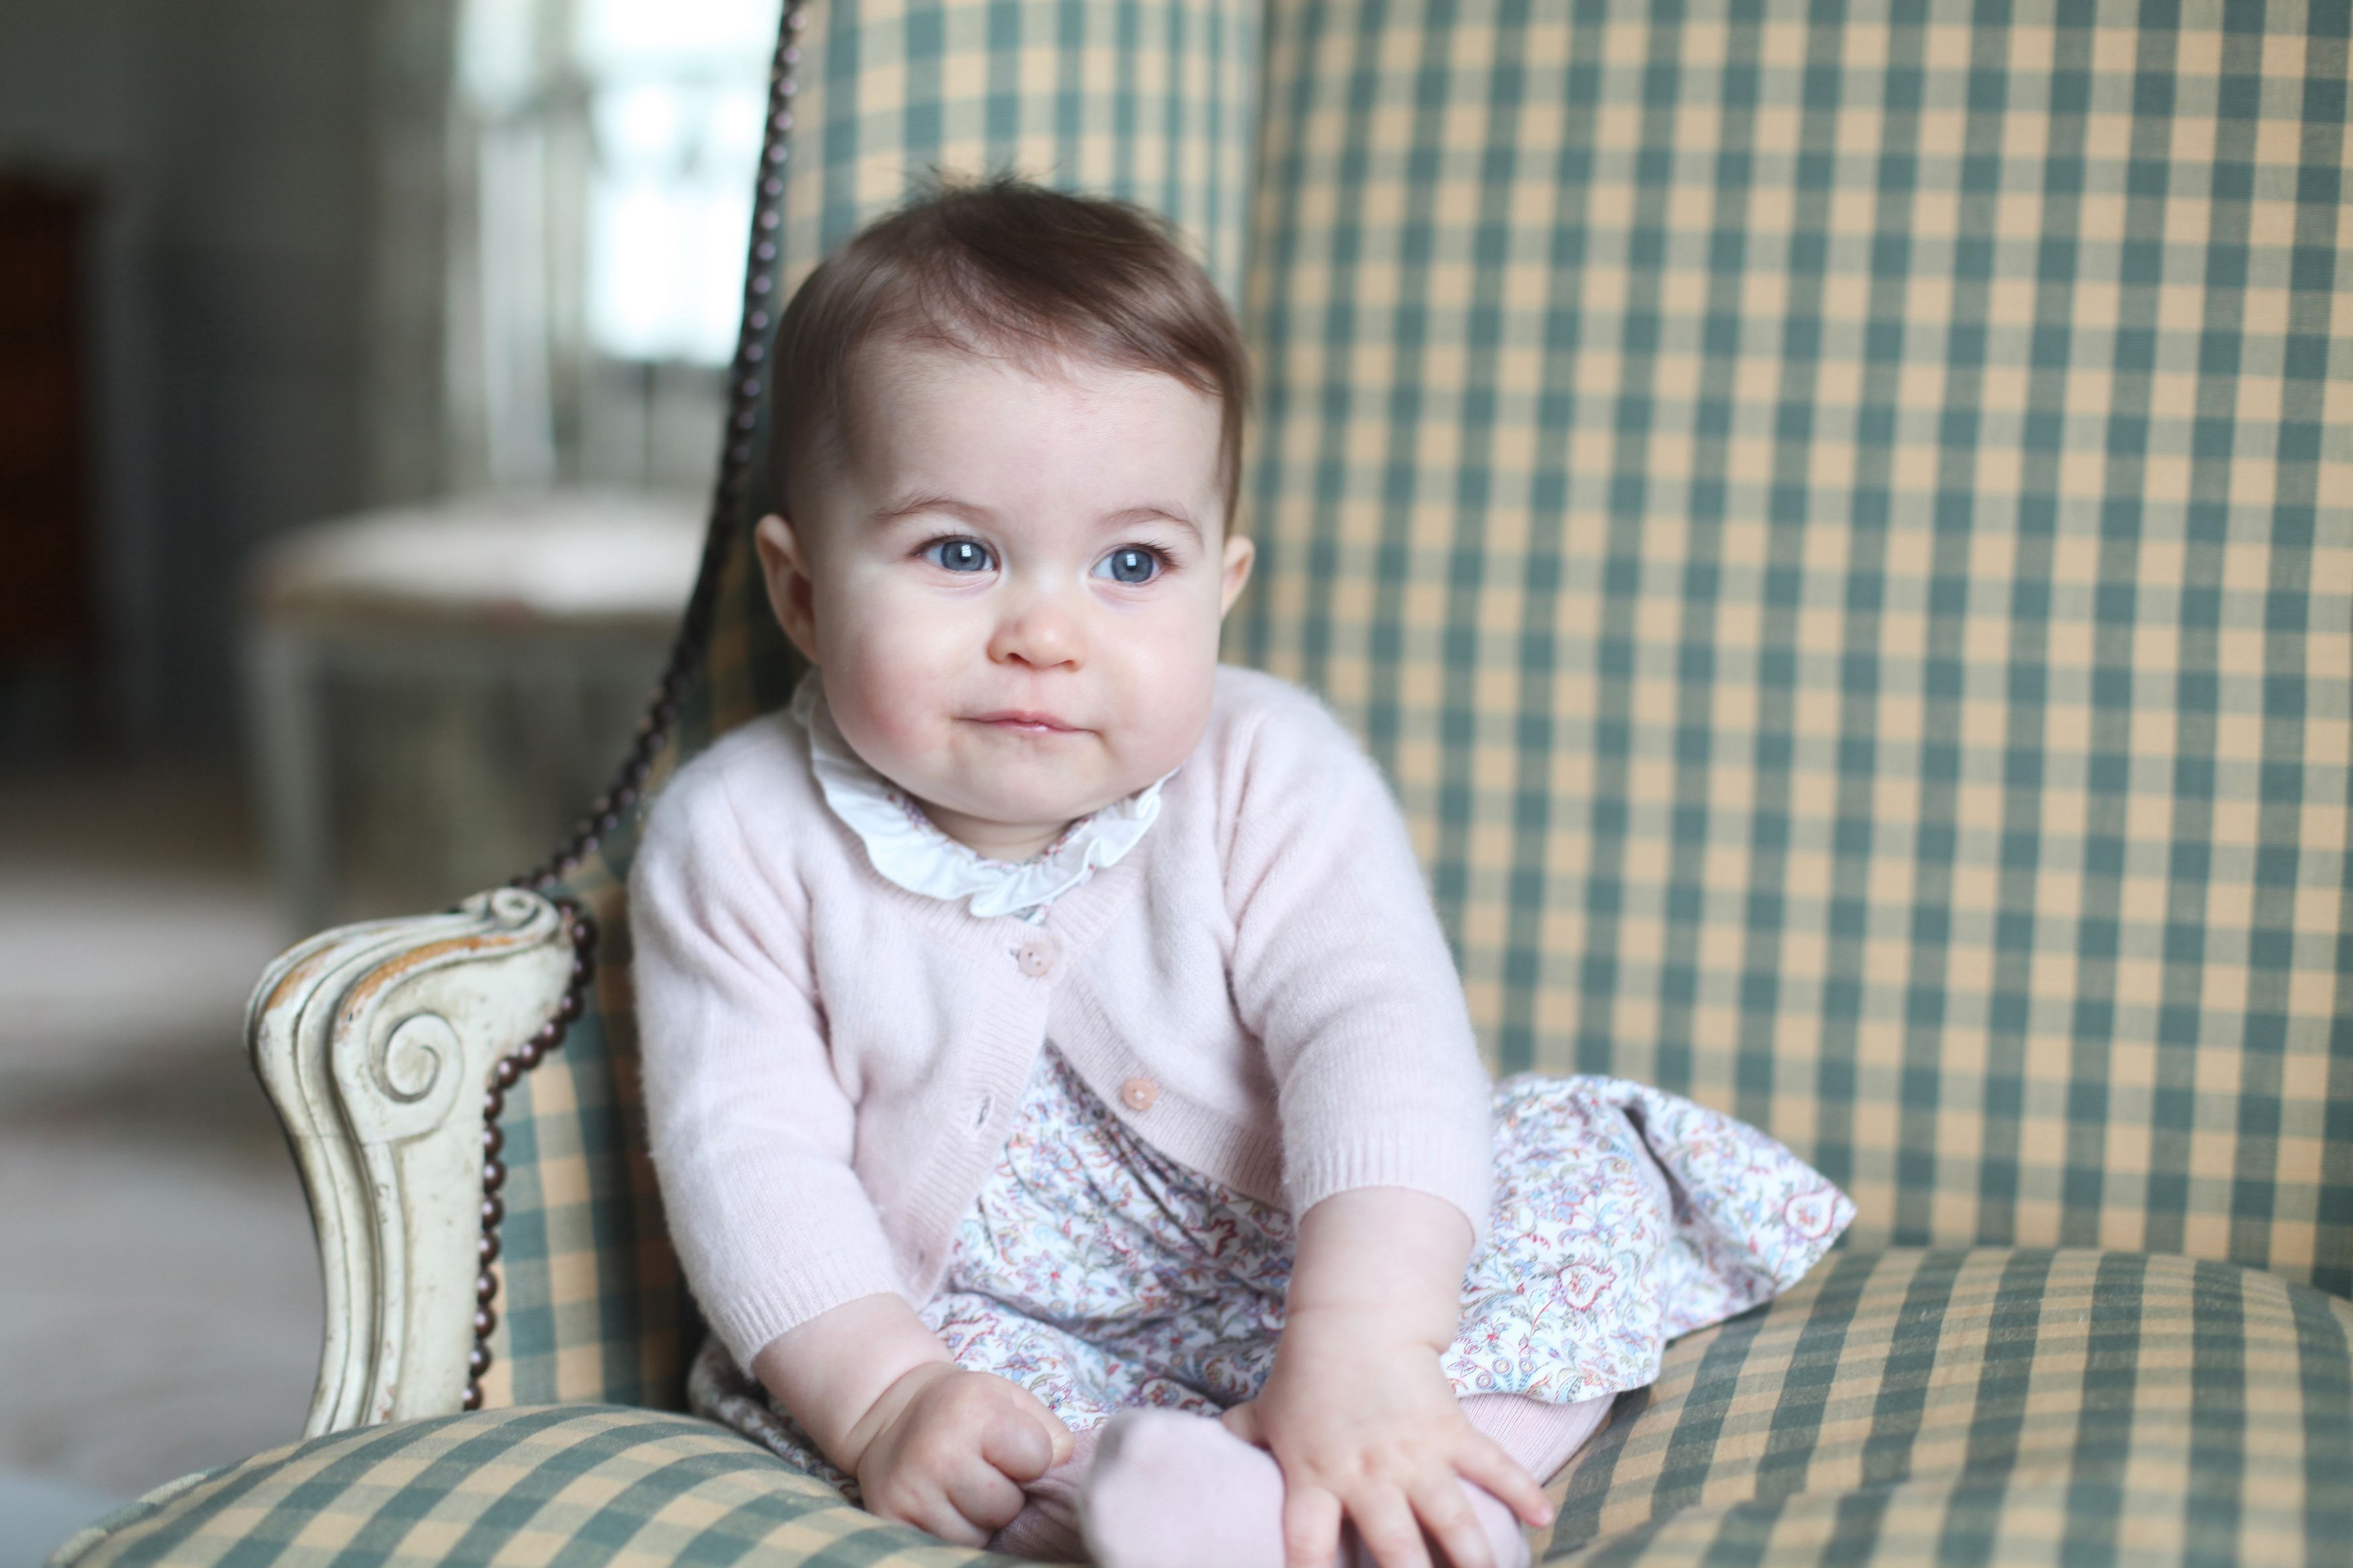 Princess Charlotte at Anmer Hall in Sandringham, UK in Nov. 2015.